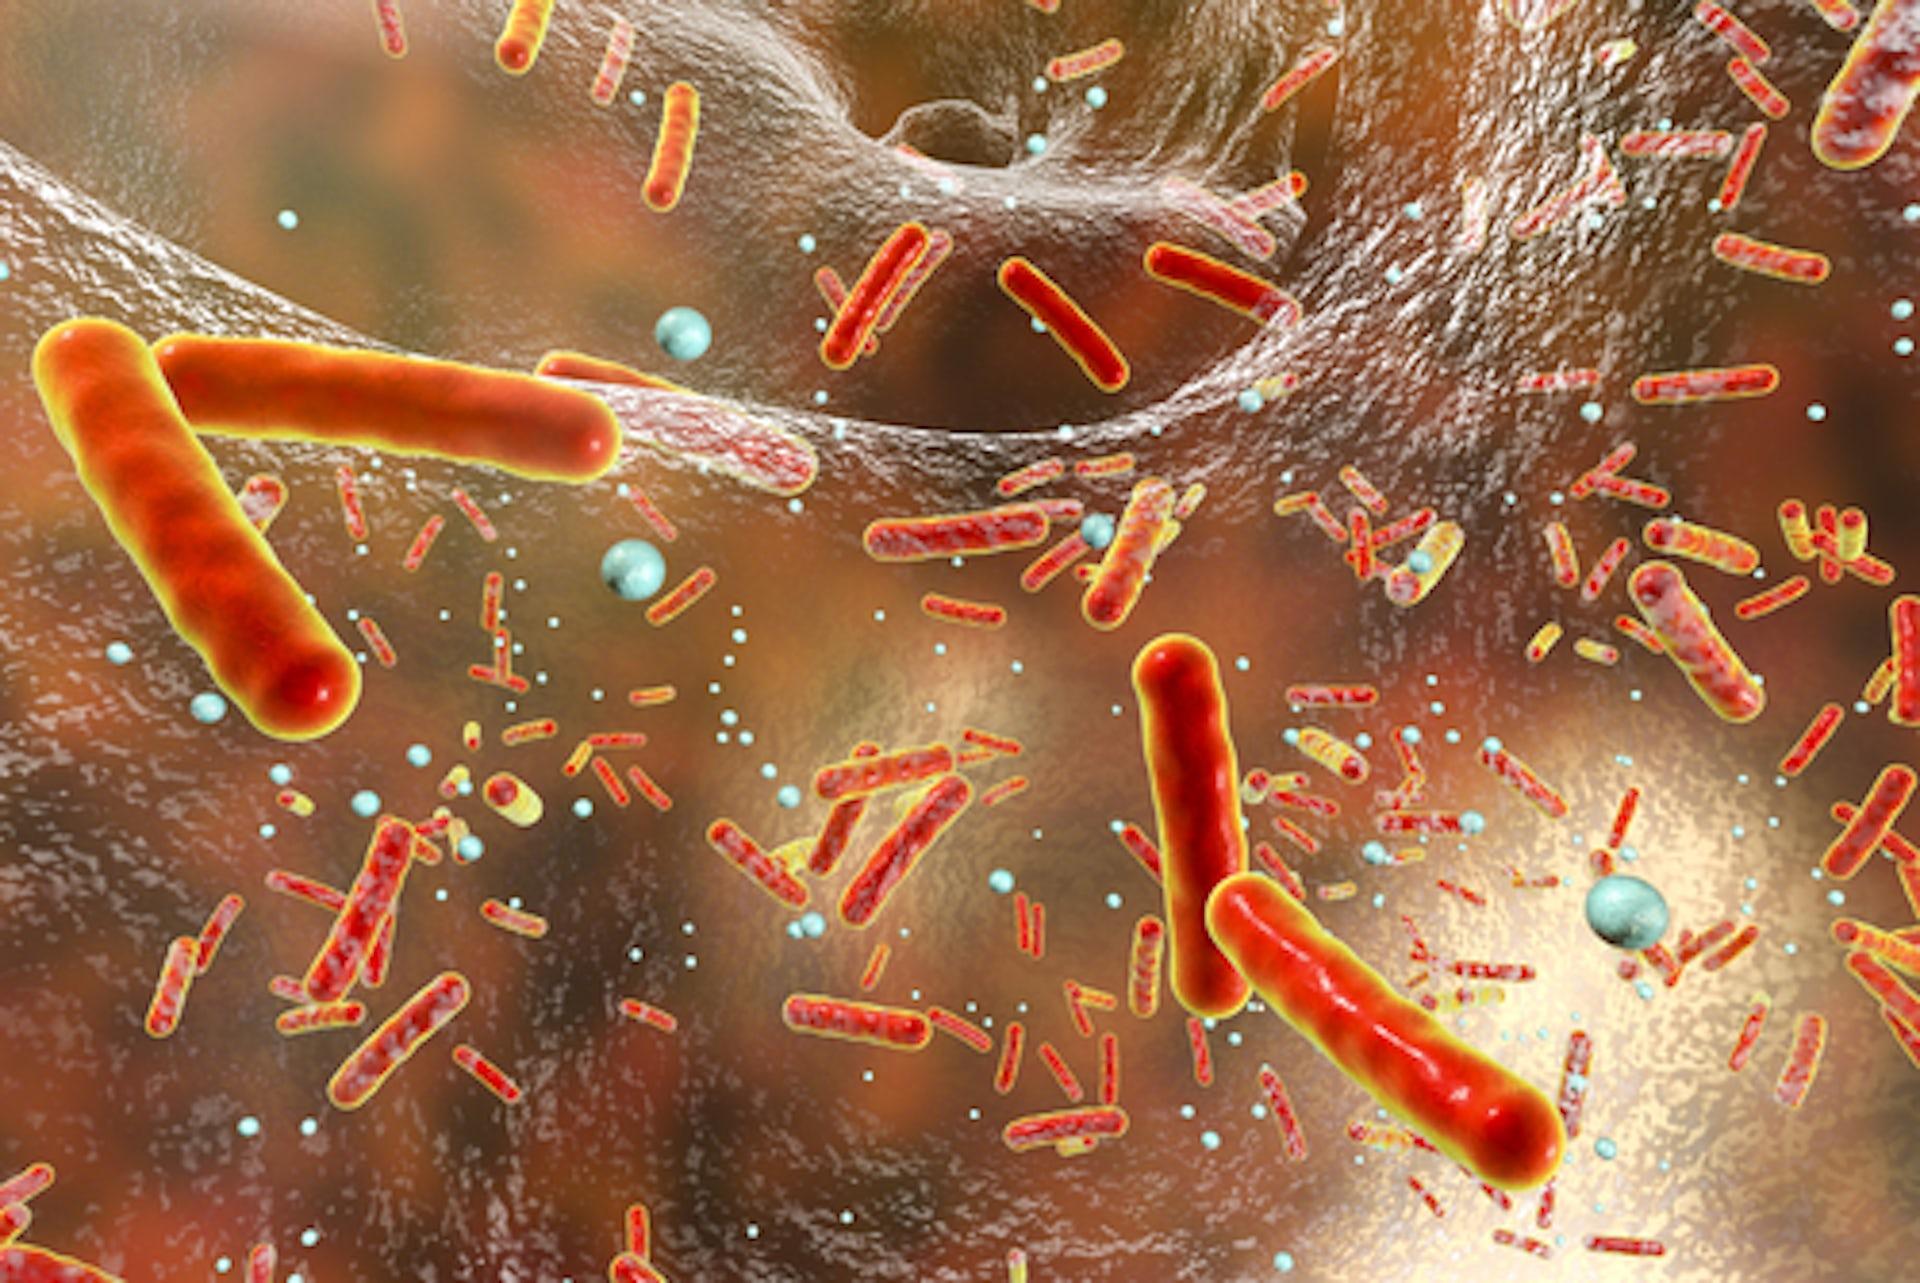 microscopic cells